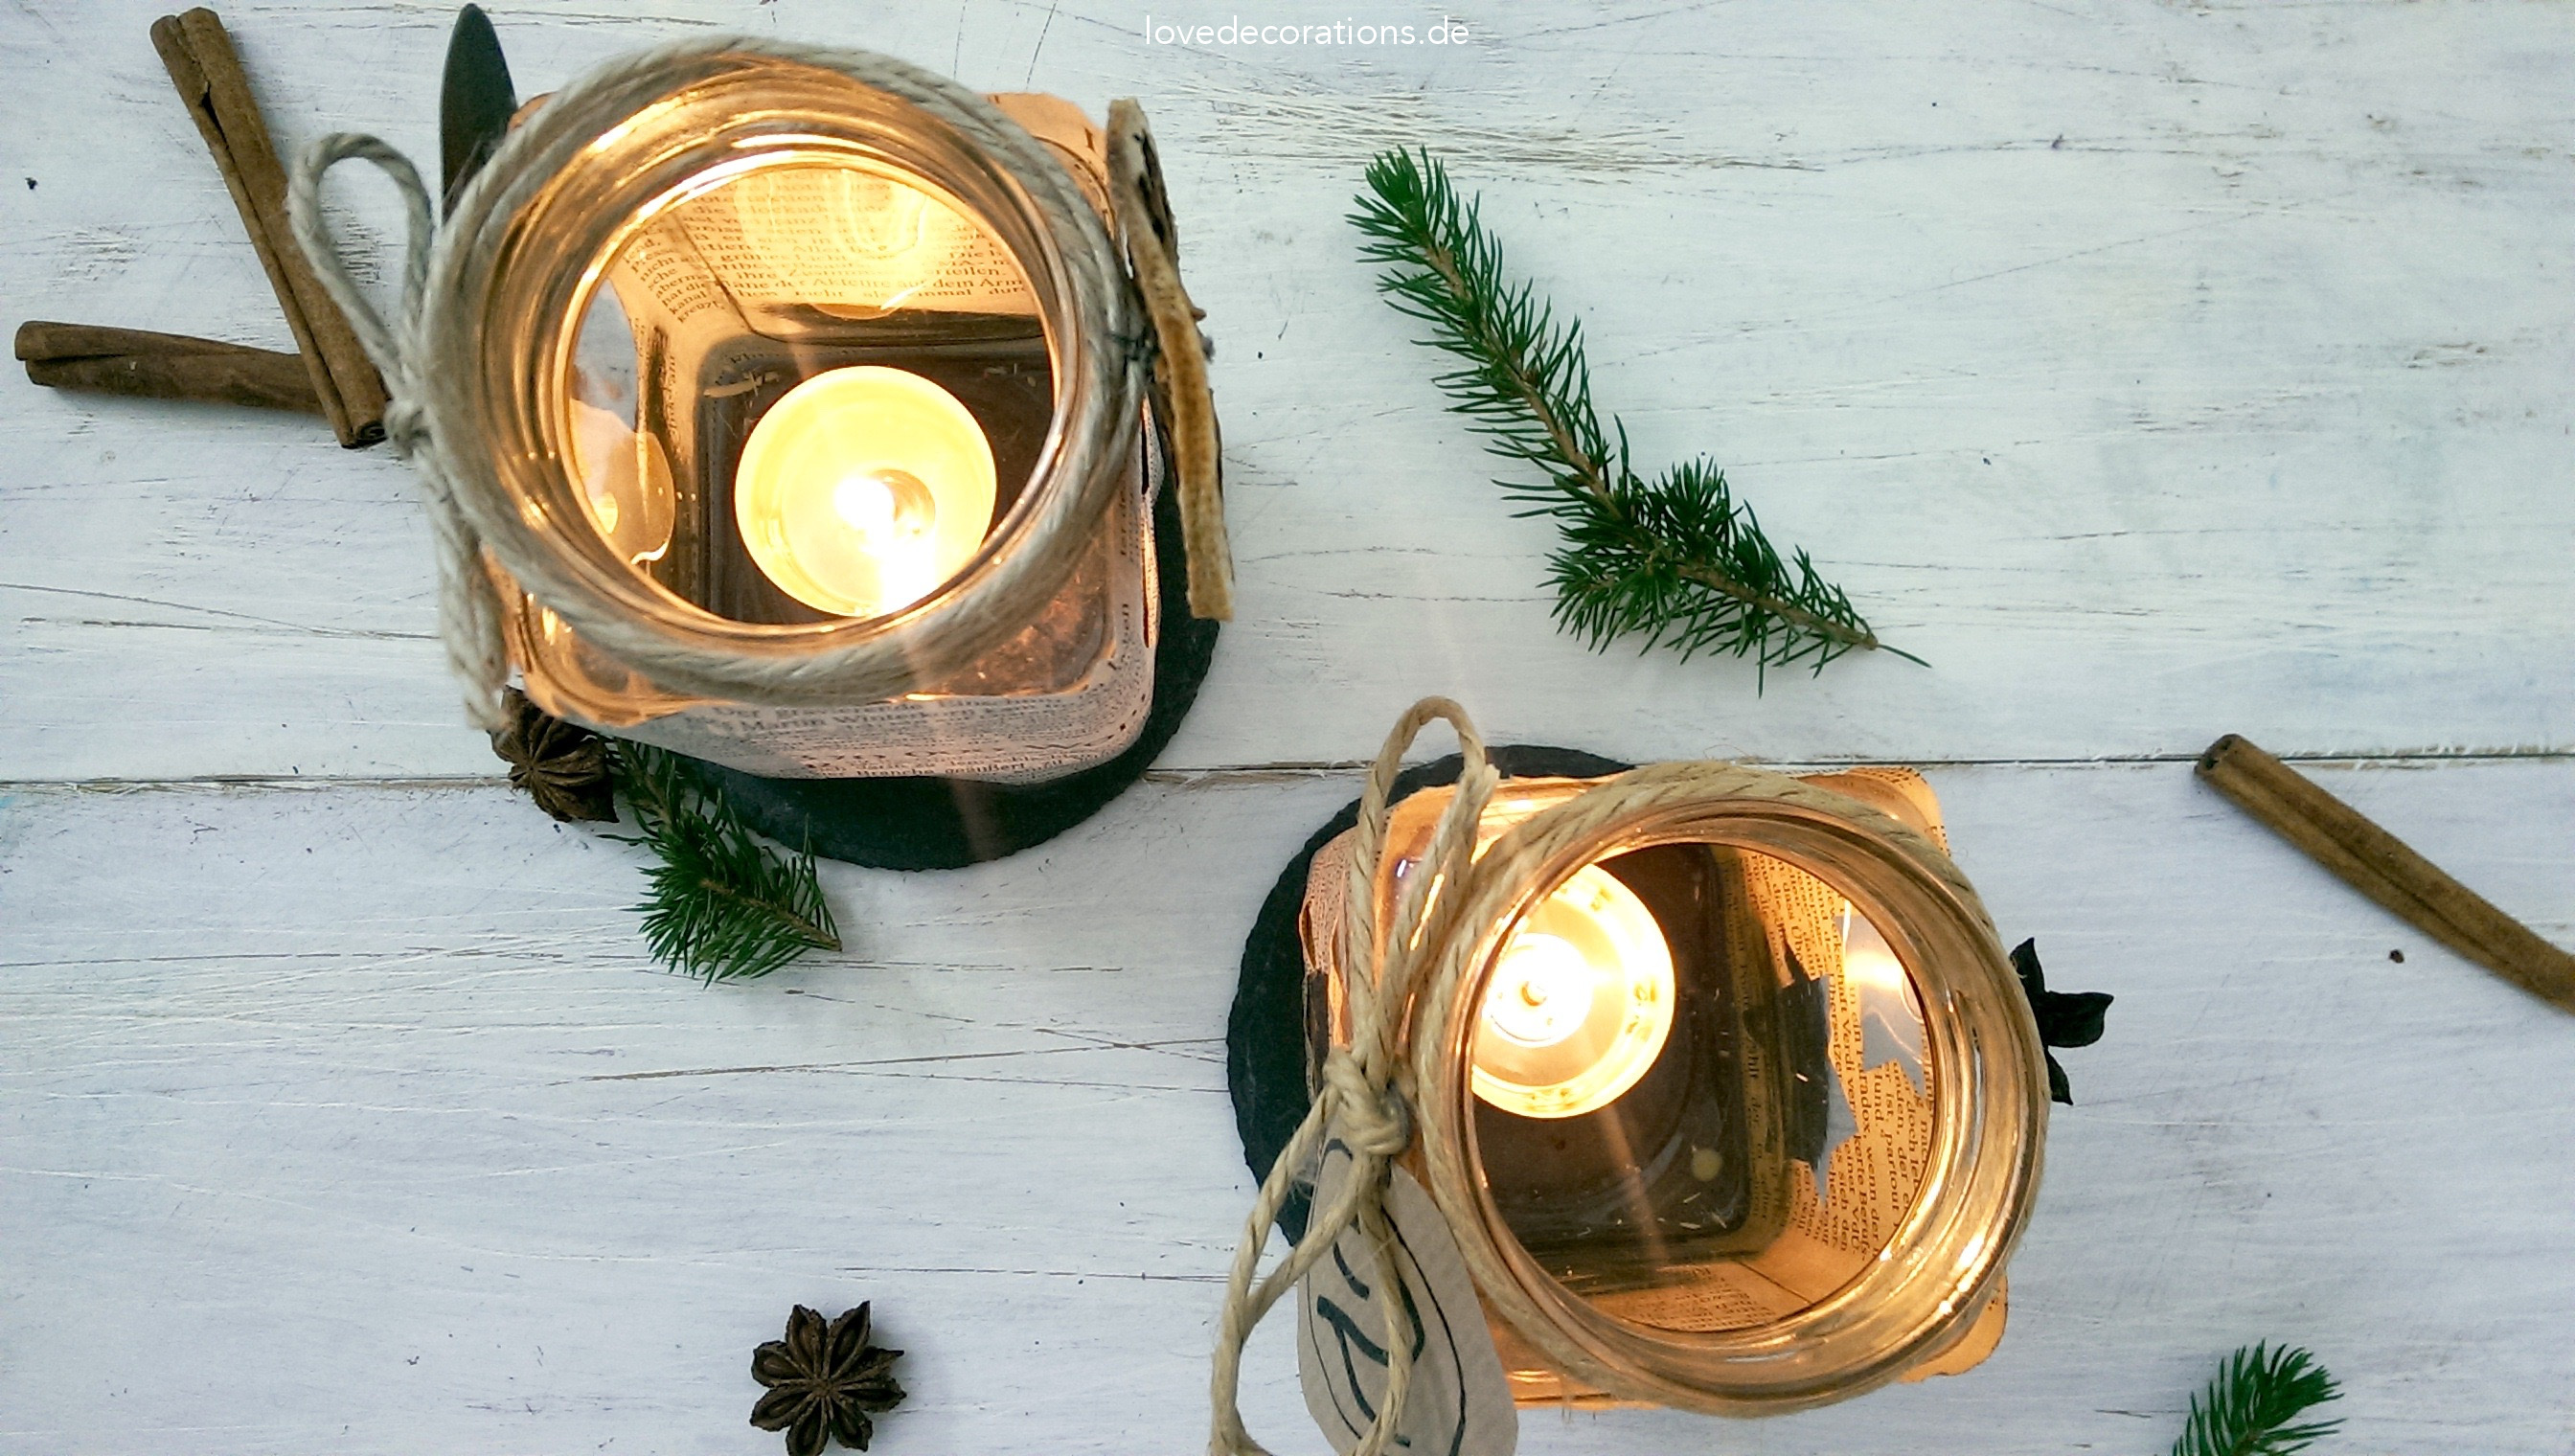 wiederholungst ter unser adventskranz love decorations. Black Bedroom Furniture Sets. Home Design Ideas